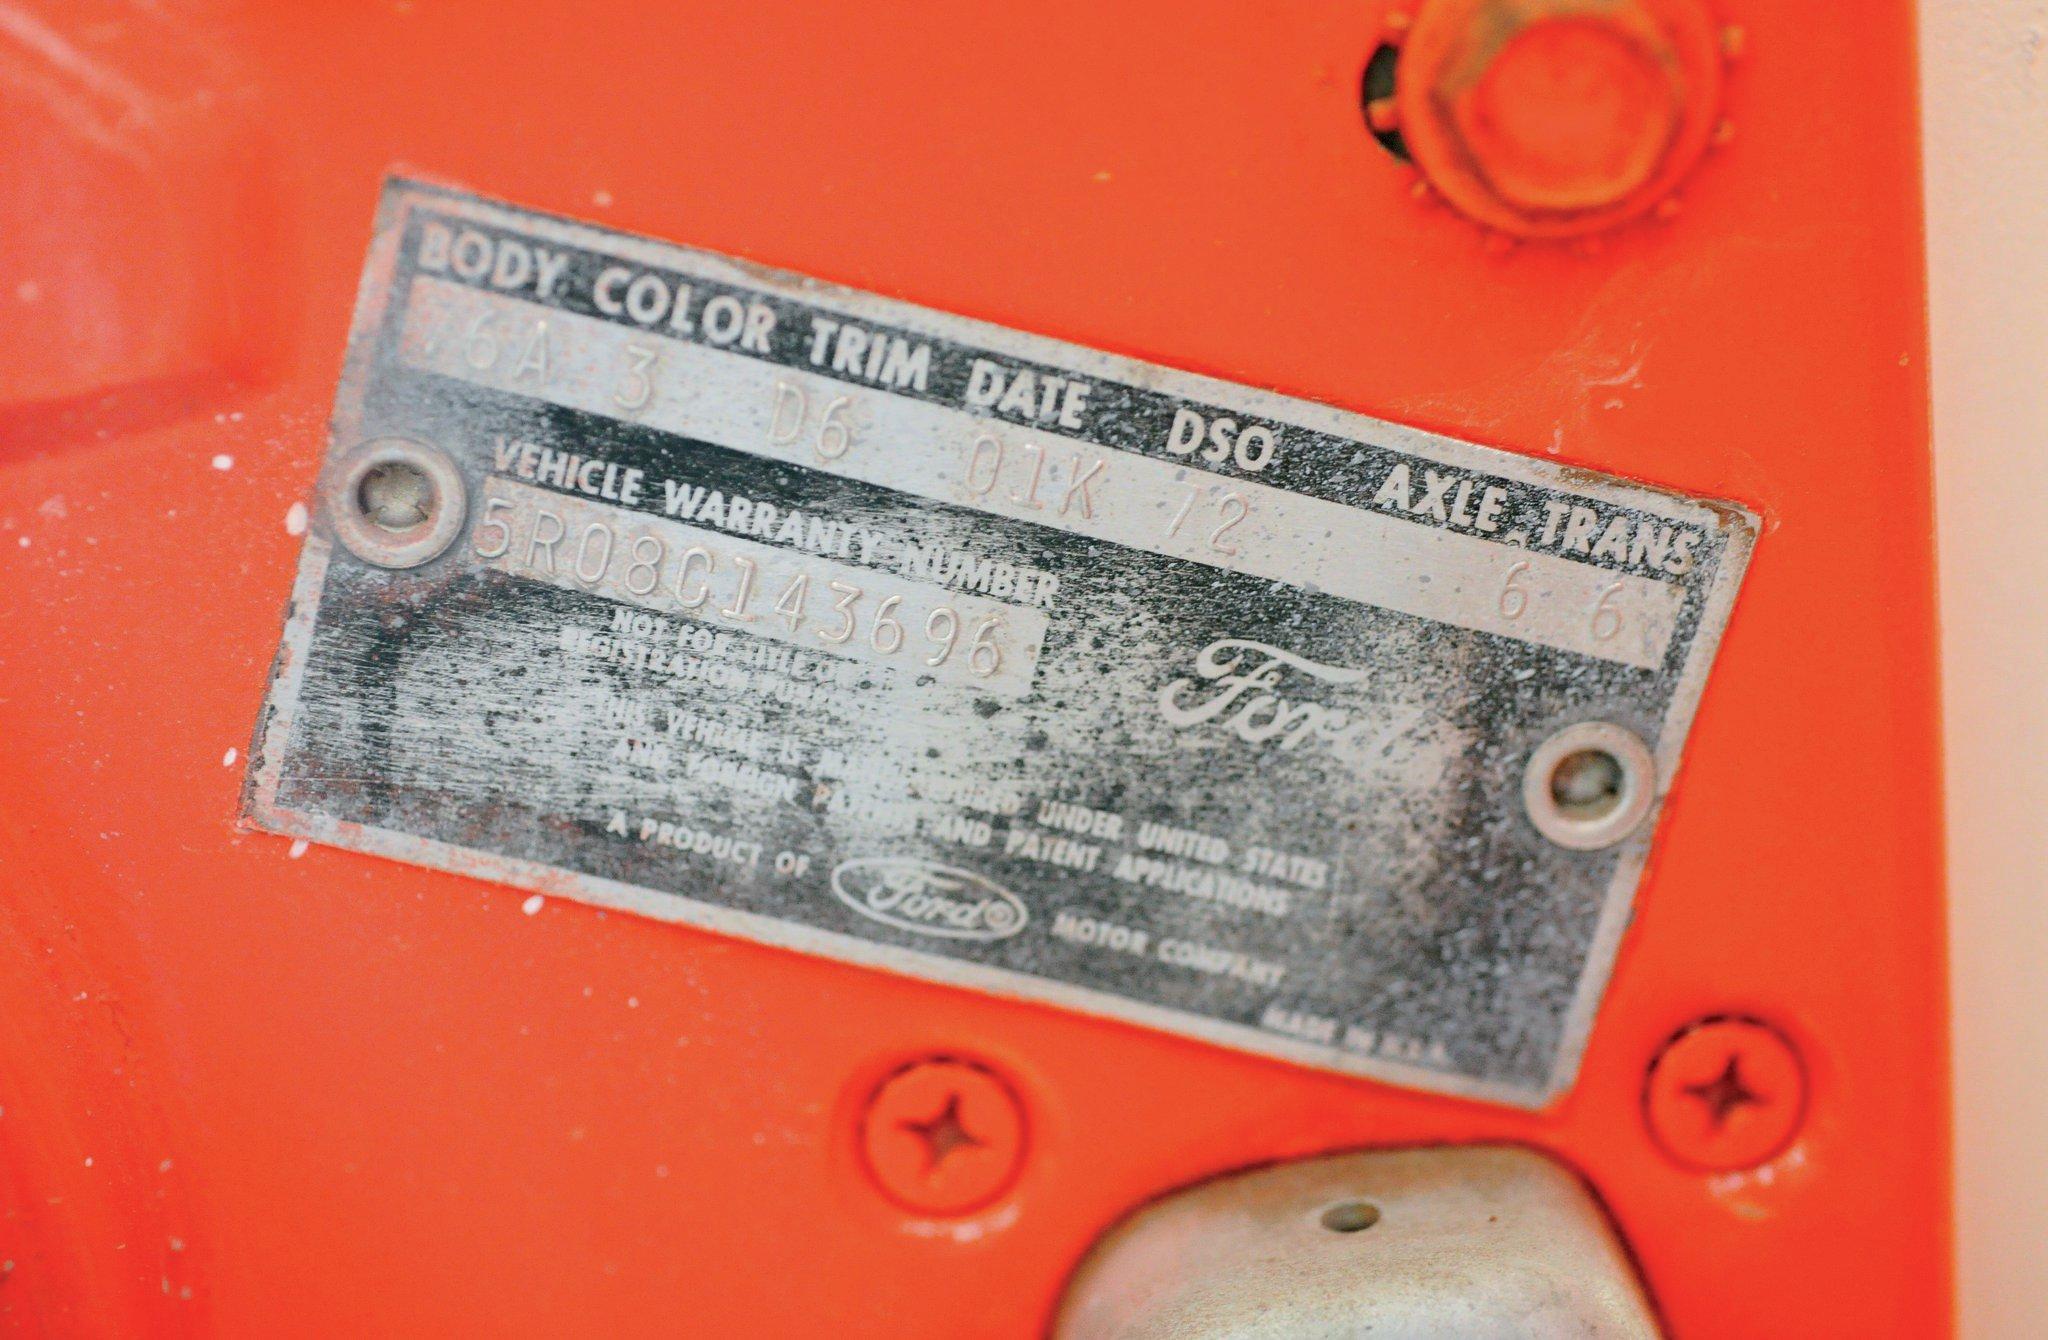 1965 Ford Mustang Door Tag